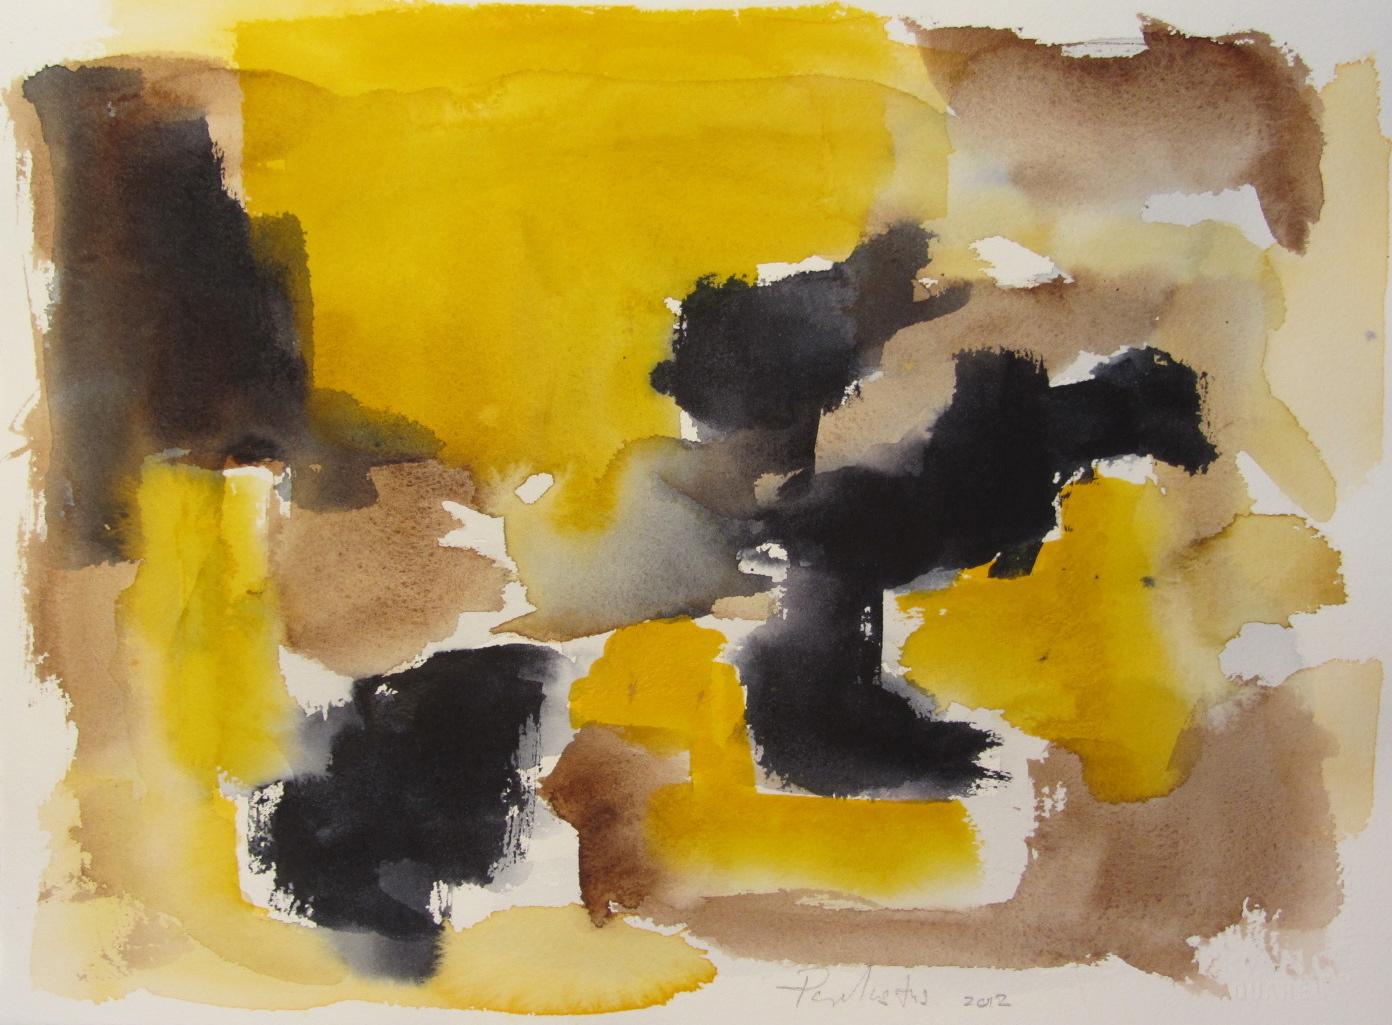 2012, watercolour on paper 27.94 x 38.10cm (11 x 15in.) IMG_0094.JPG